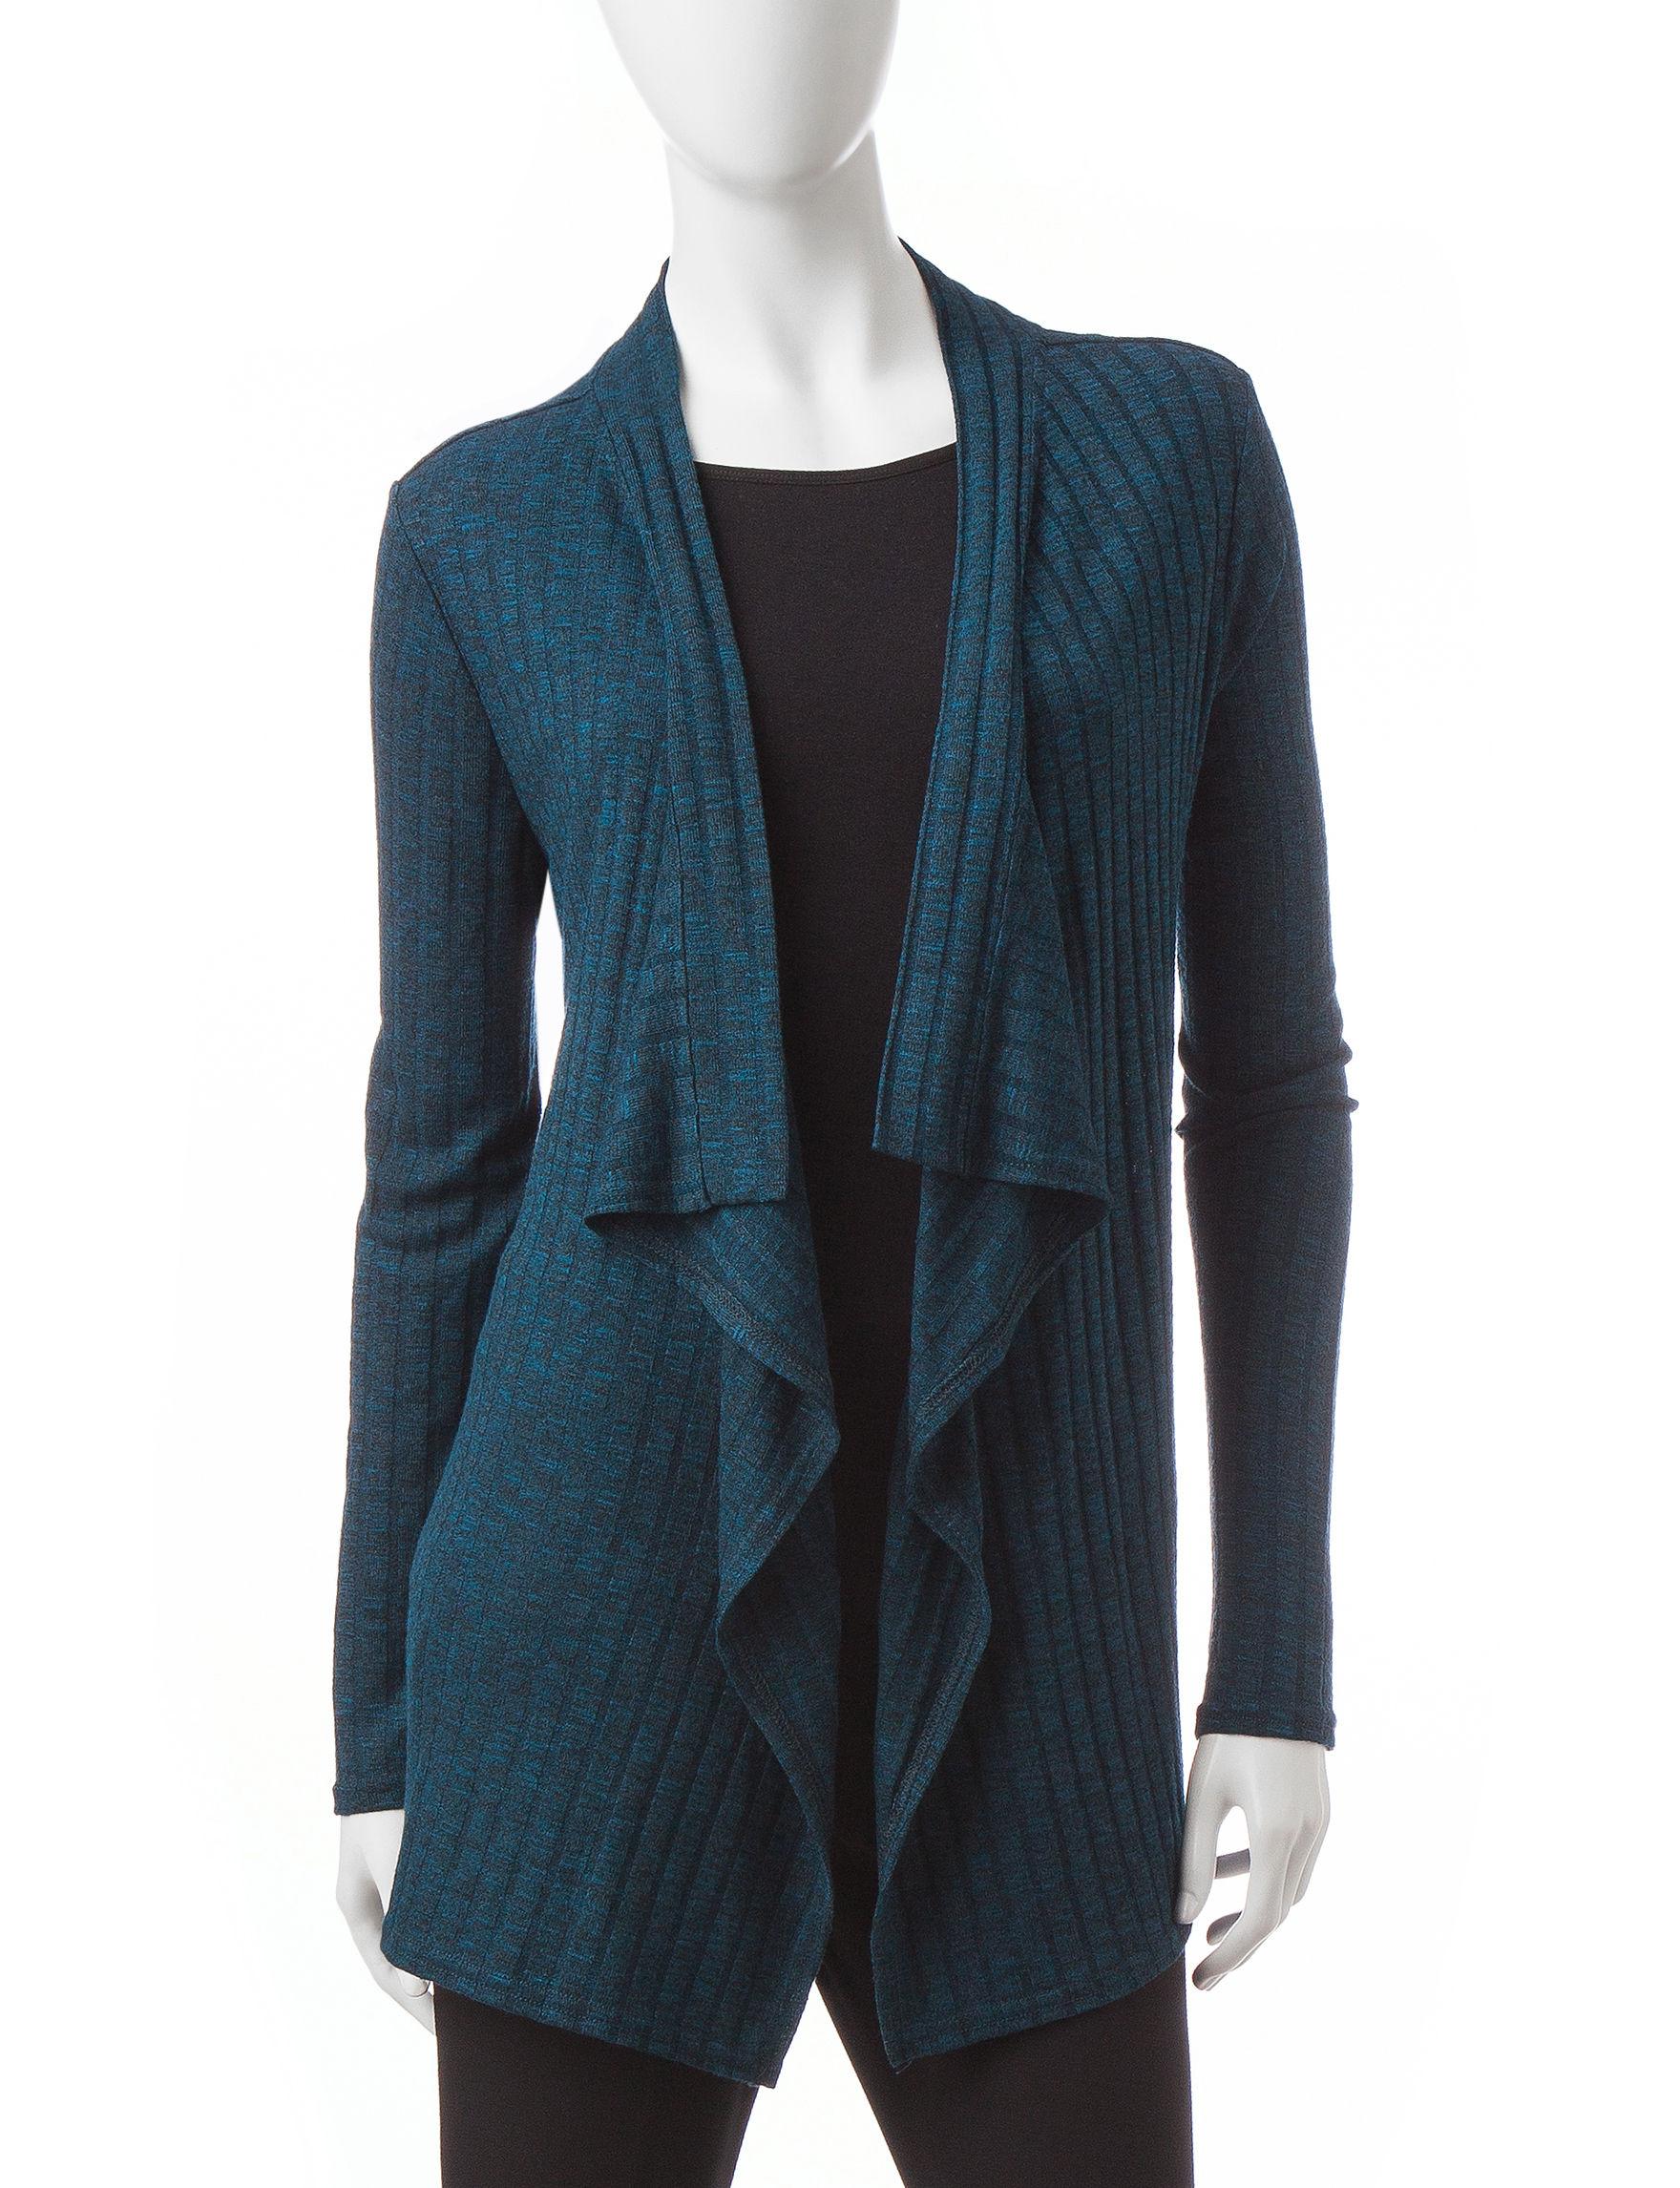 Rebecca Malone Navy / Black Cardigans Sweaters